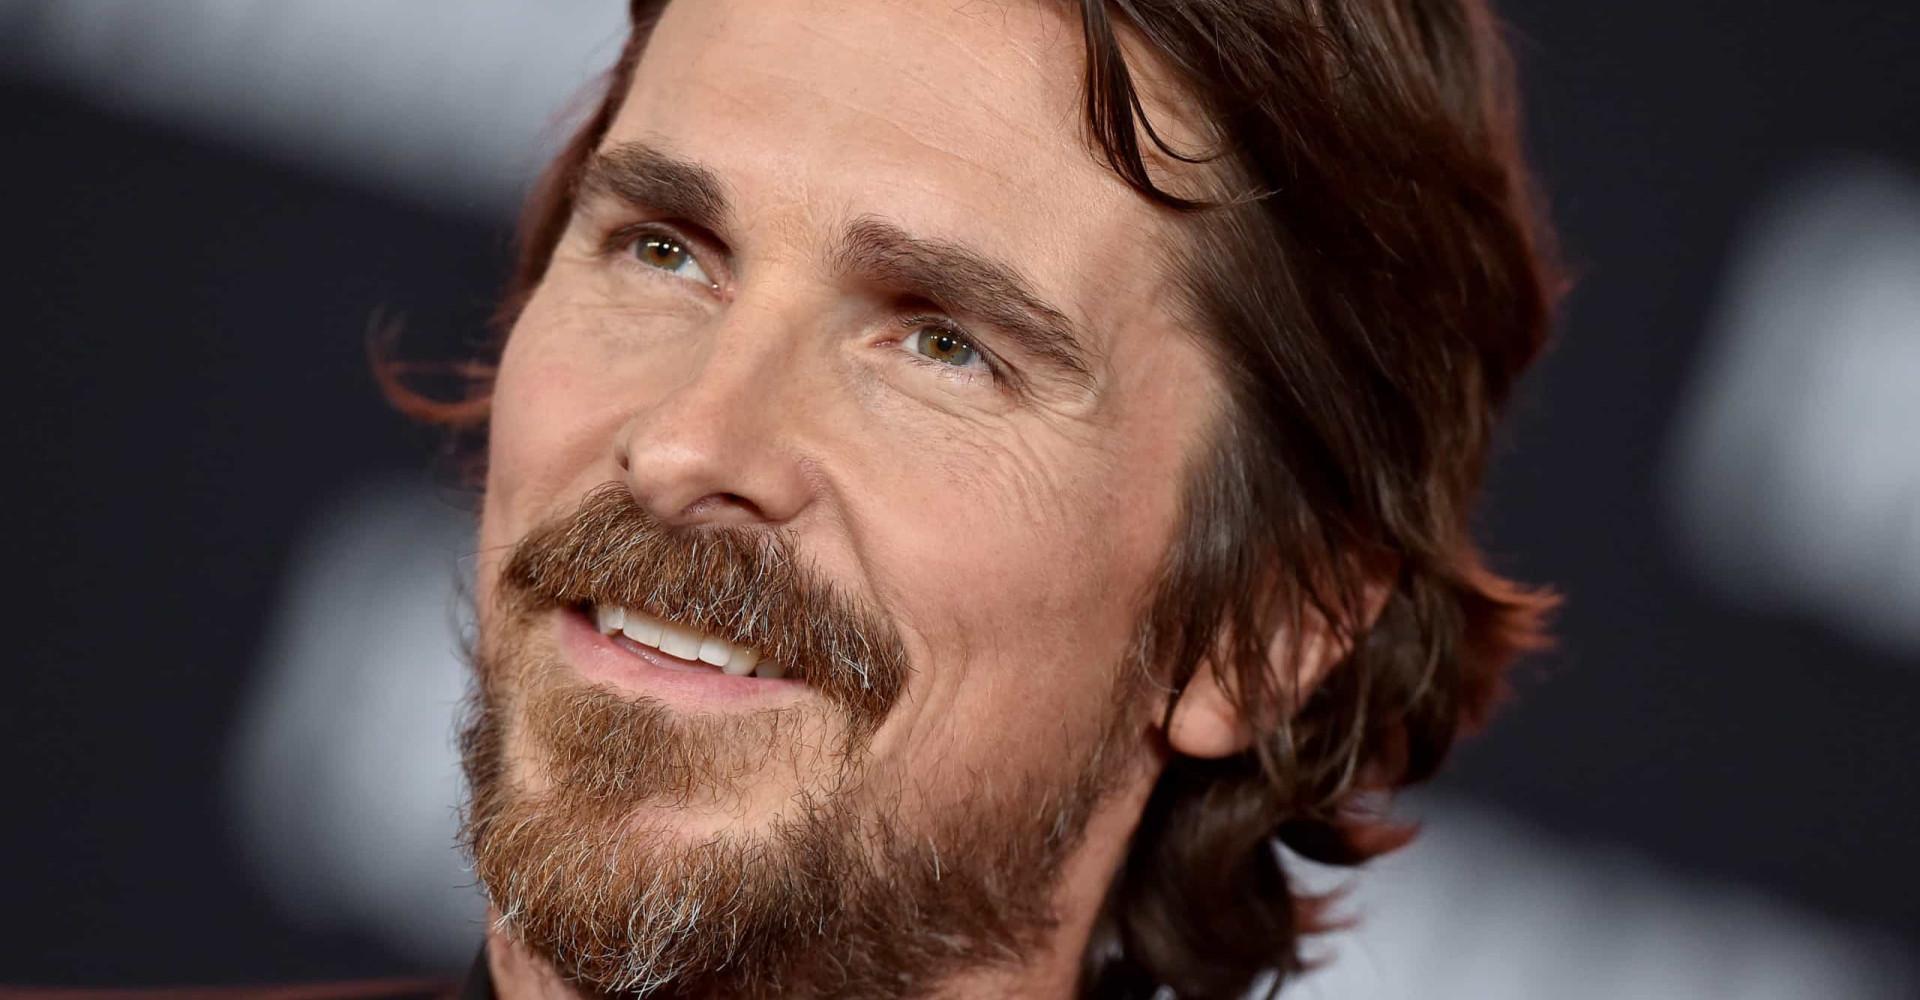 Christian Bale: héros hollywoodien ou méchant?